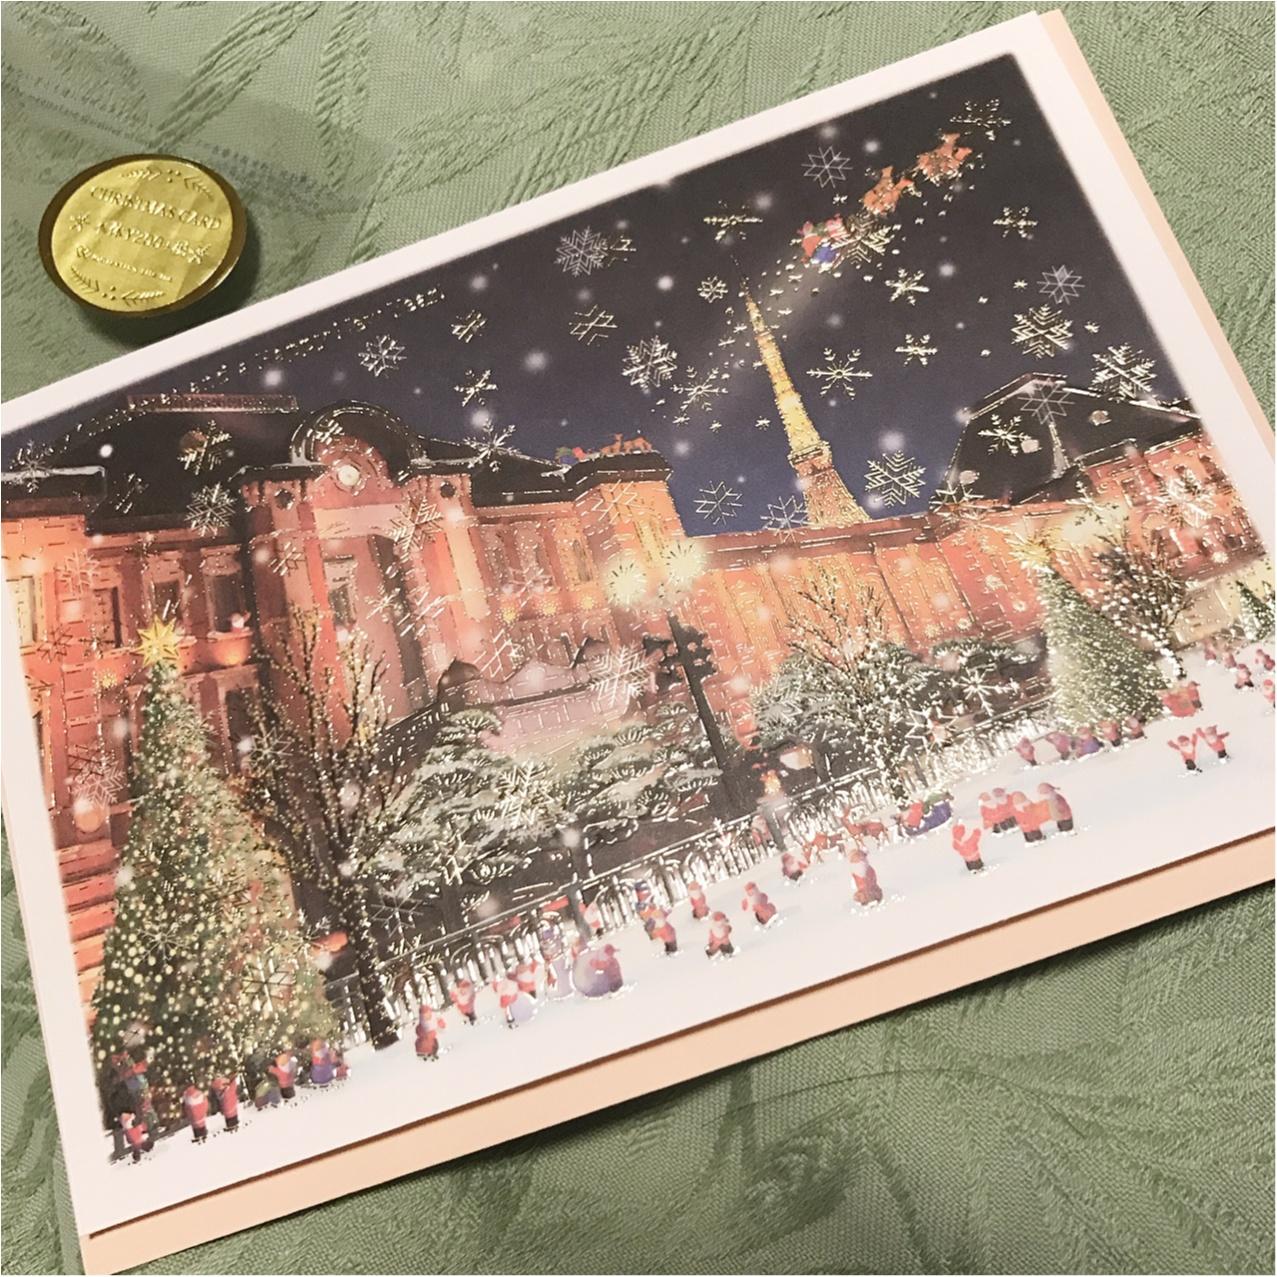 《Xmasプレゼントに添えて♡》 日本を旅するサンタさんが可愛いクリスマスカード❤︎_2